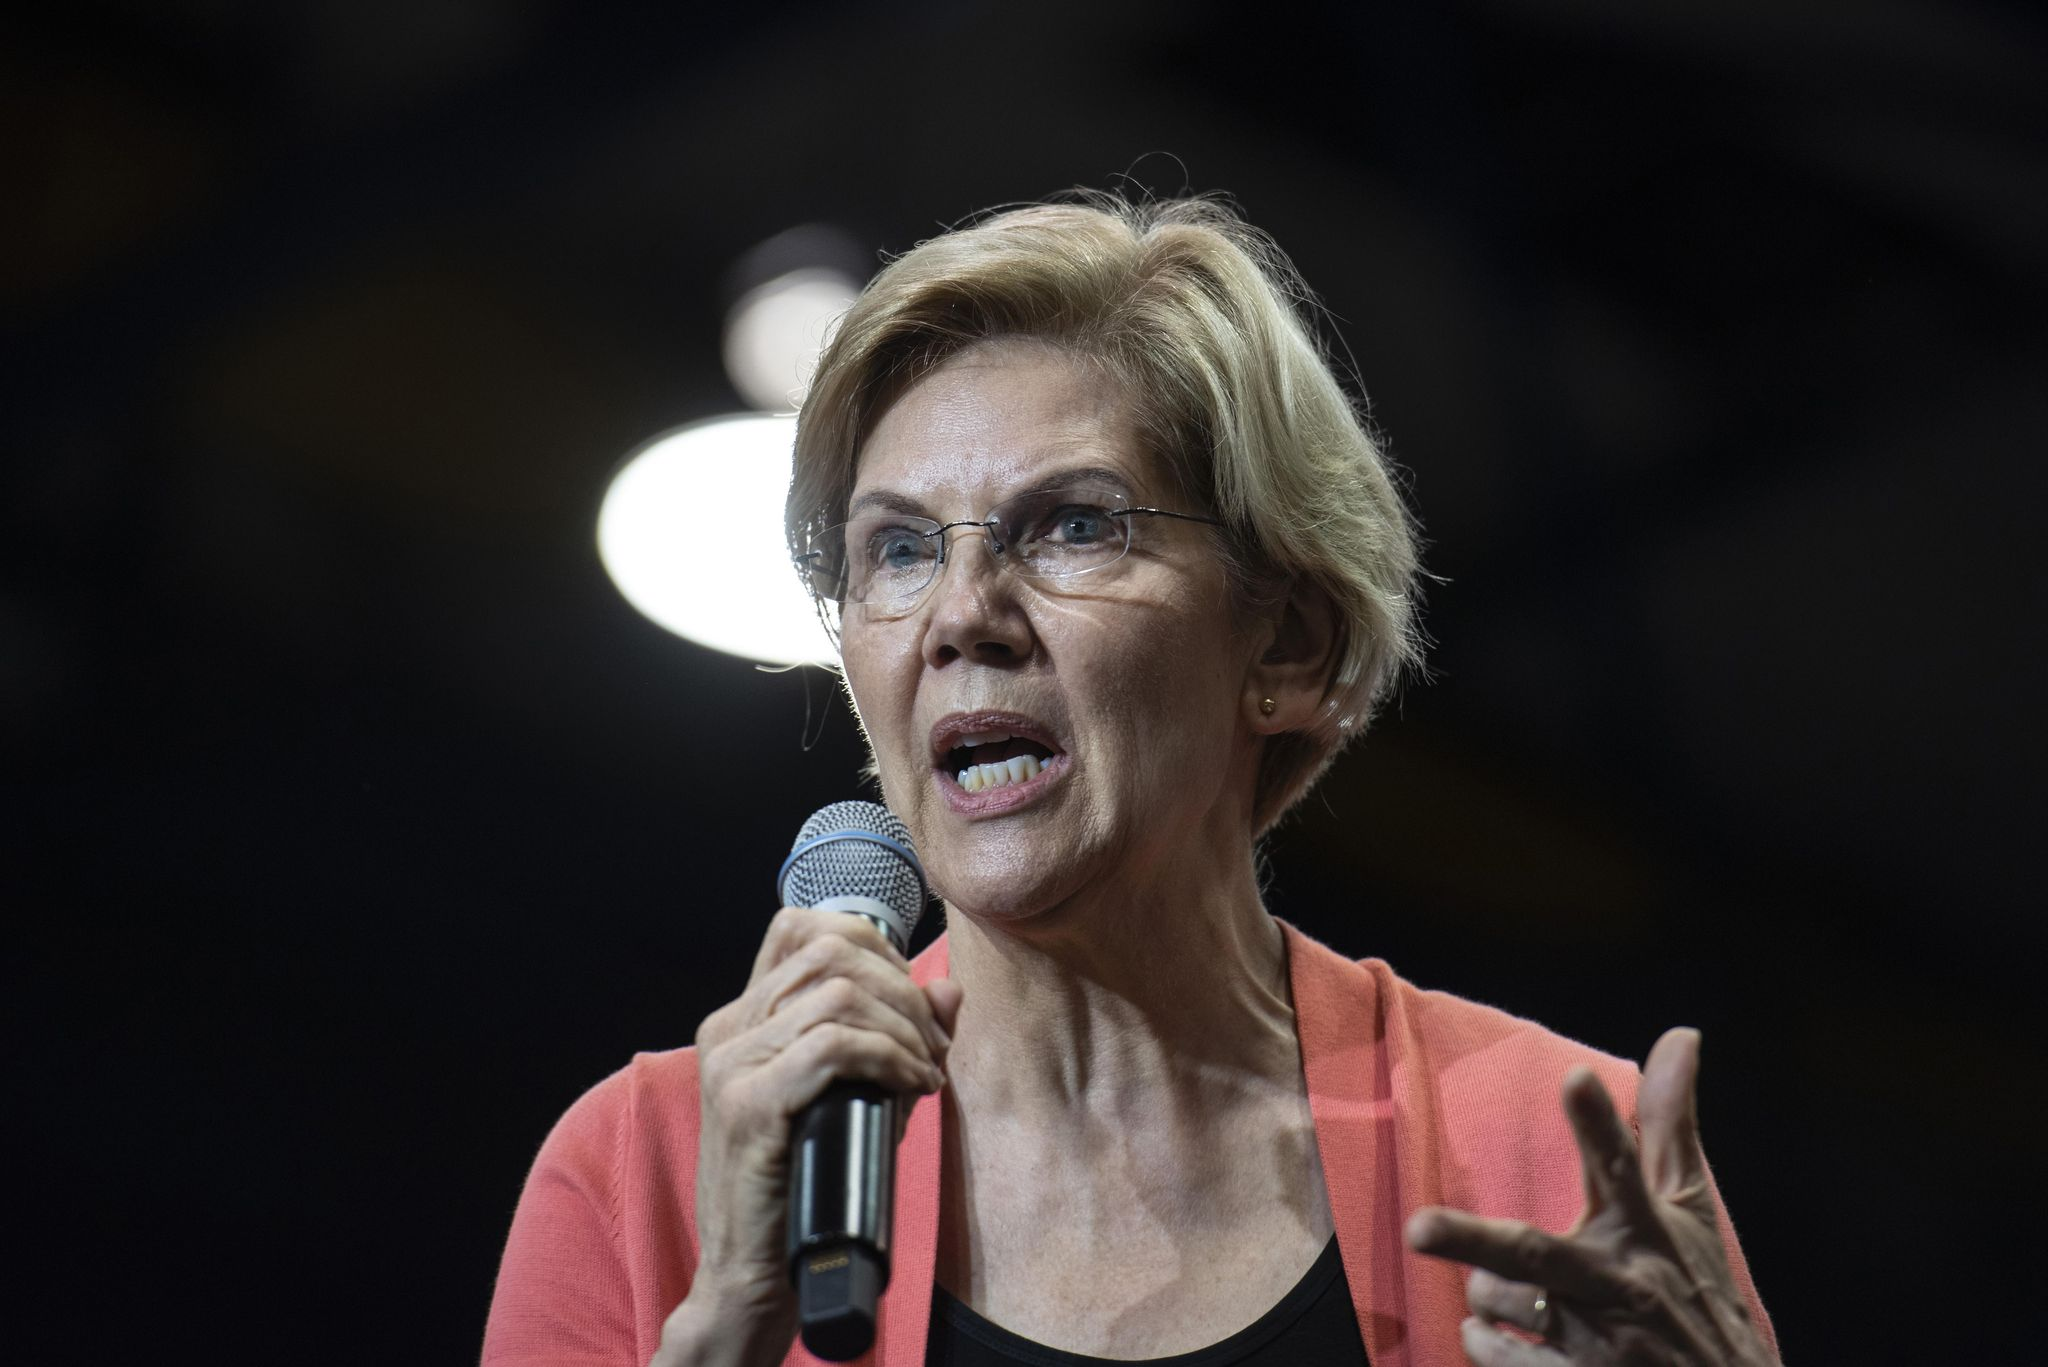 Sen. Elizabeth Warren to visit Homestead migrant facility ahead of debate